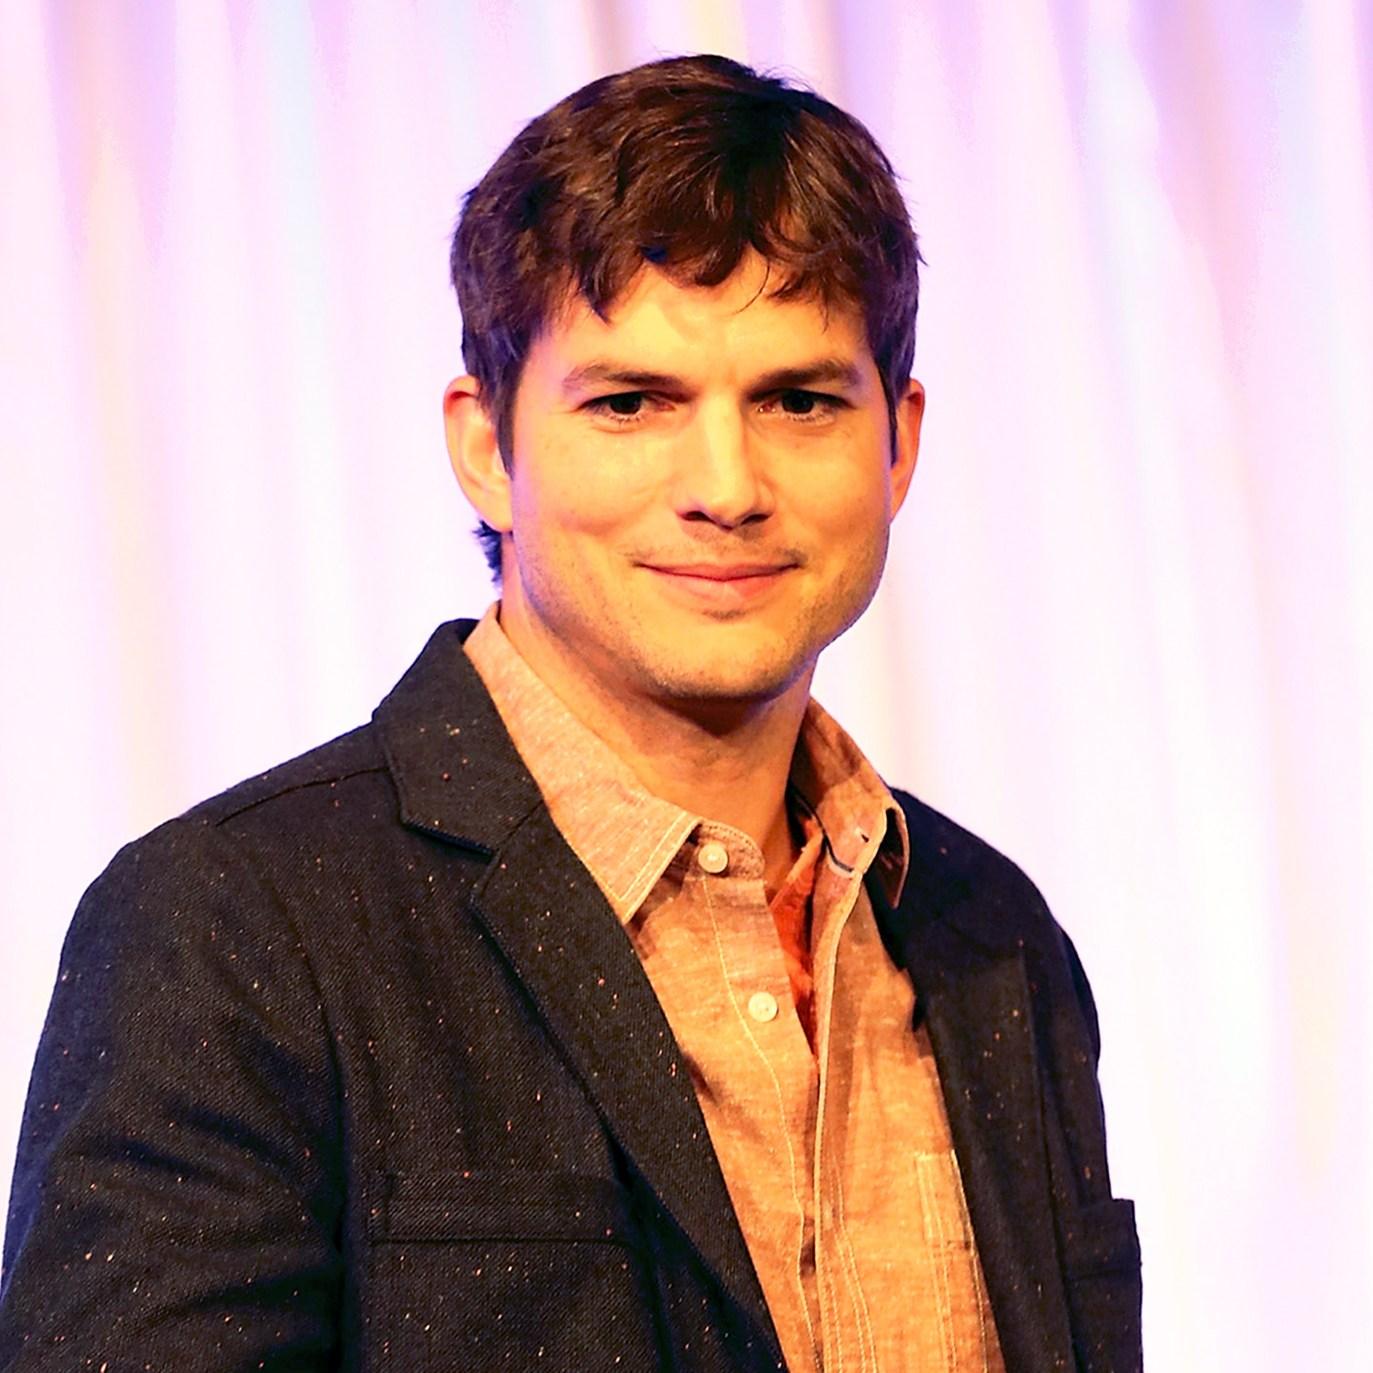 Ashton Kutcher attends City Summit 2018 at Universal Studios Hollywood in Universal City, California.